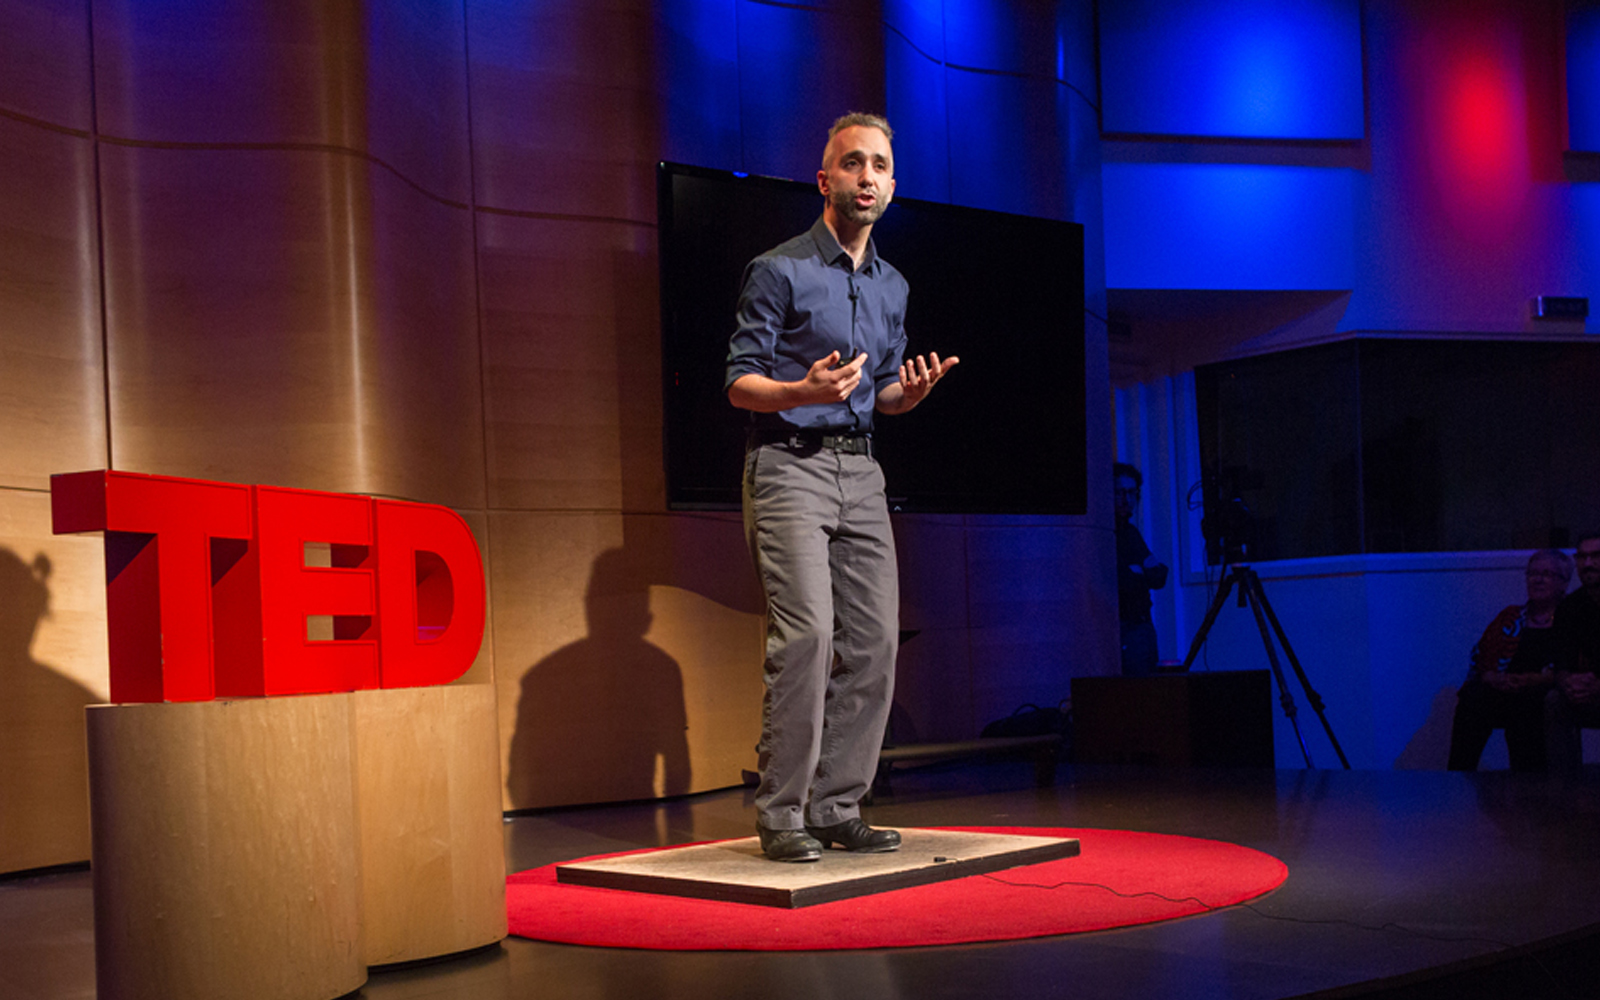 Andrew Nemr, TED Fellow